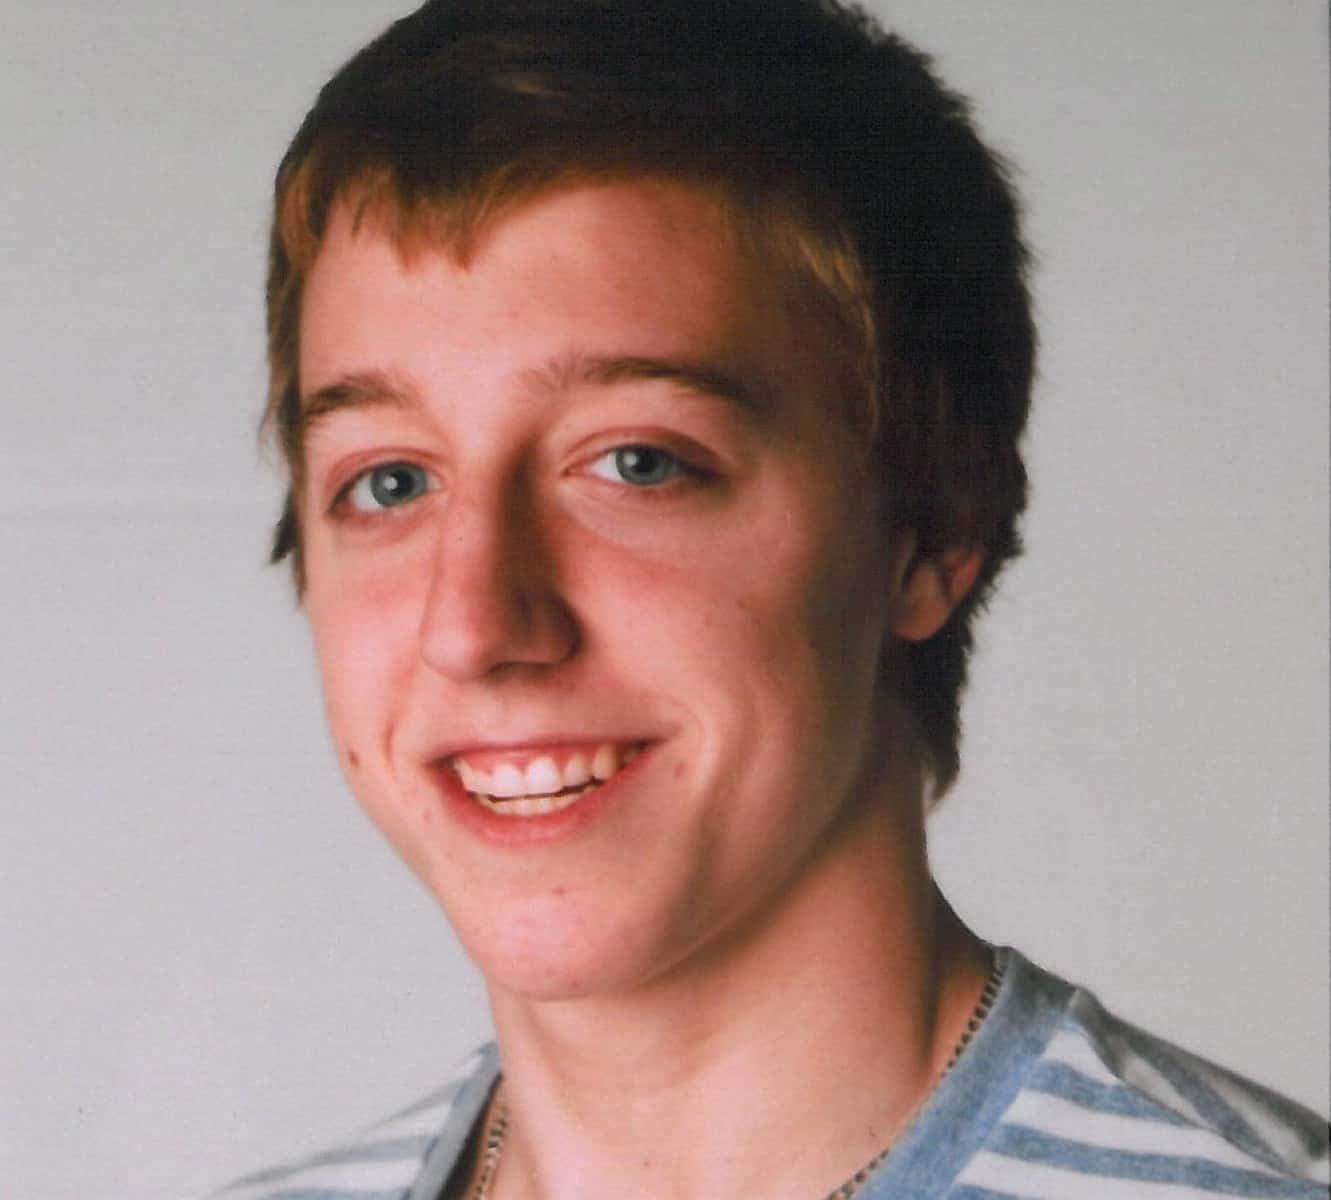 Tyler Frederes